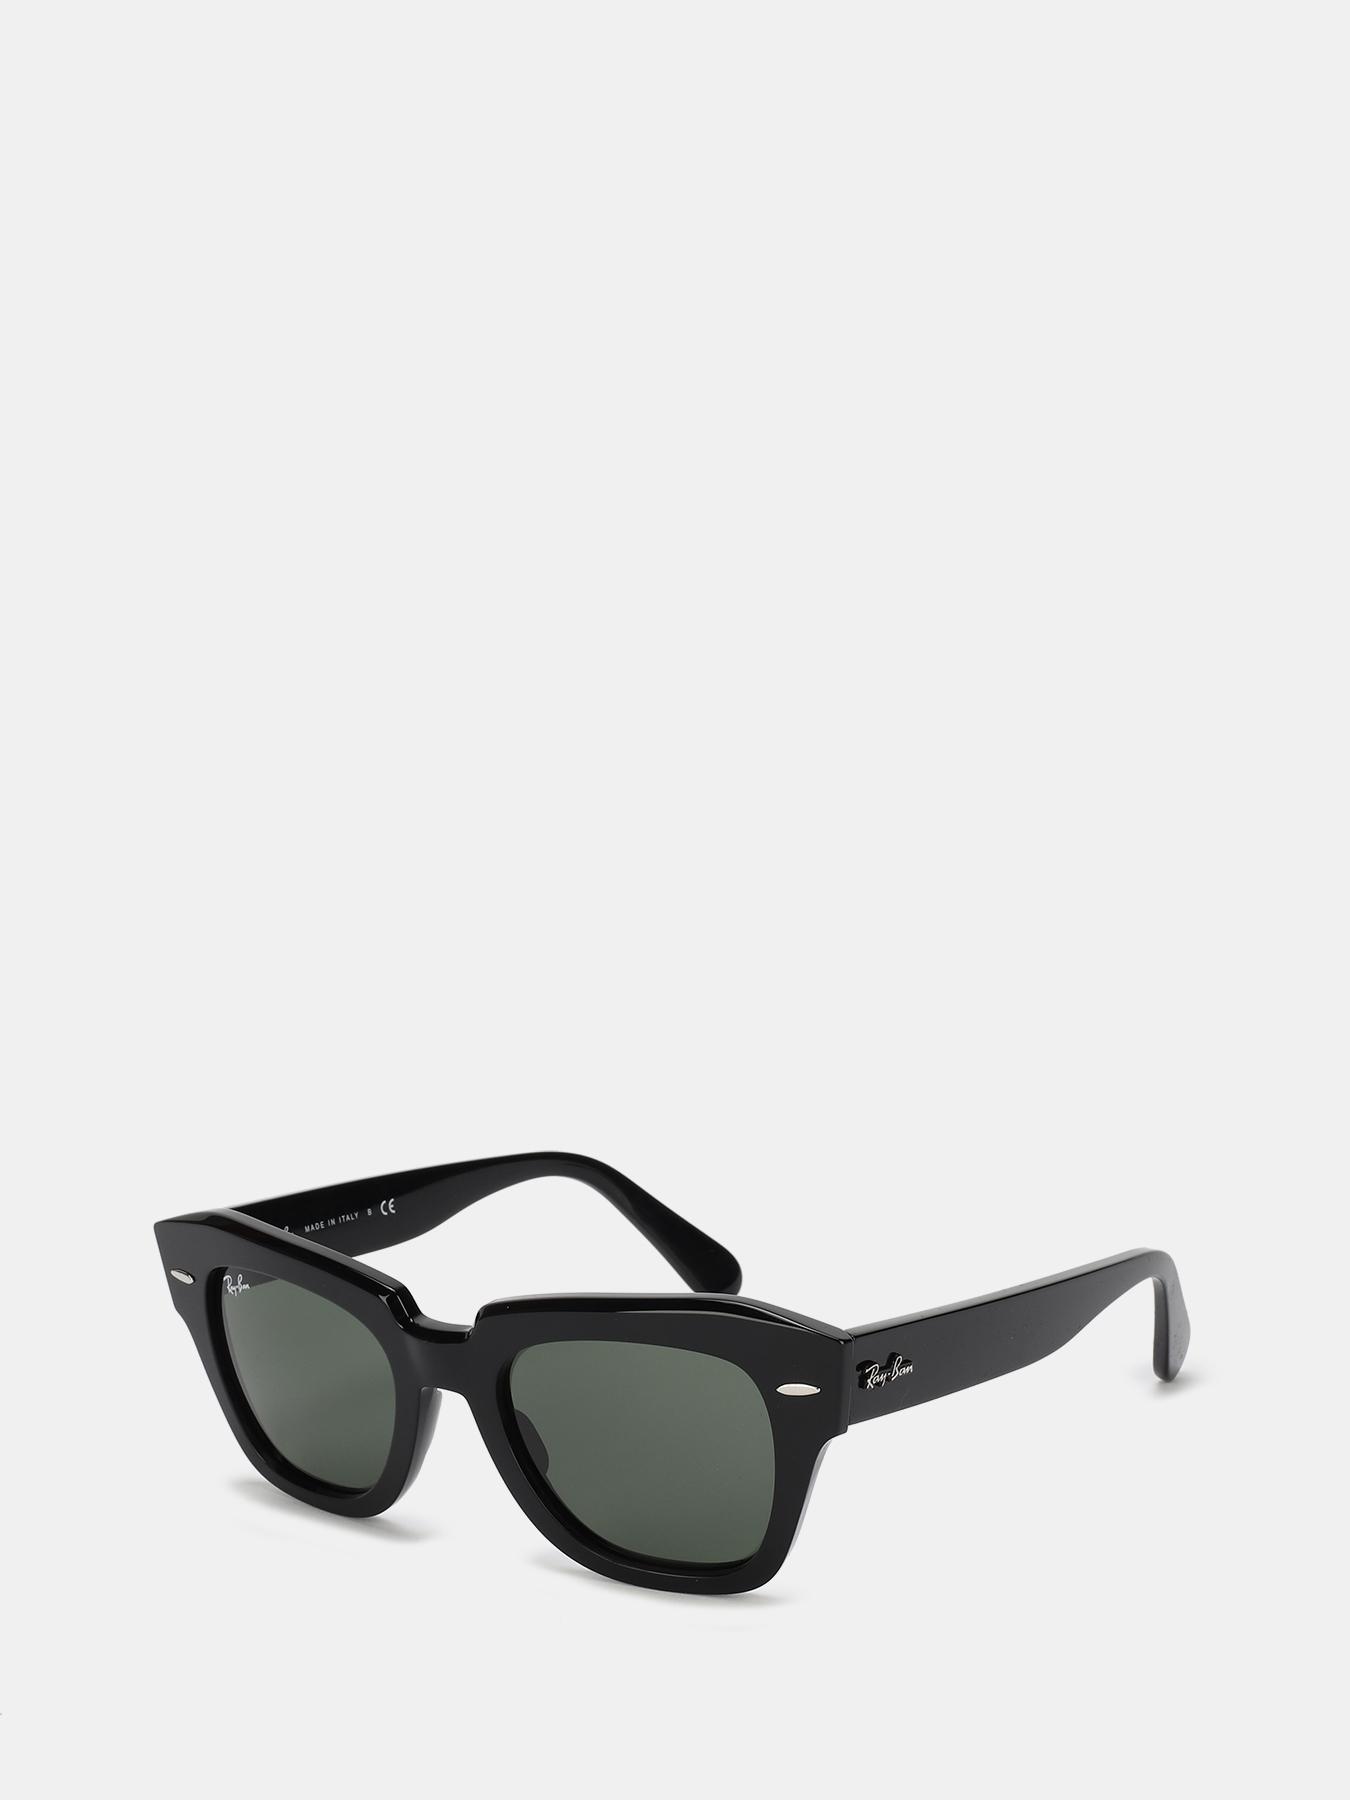 Очки Ray-Ban Солнцезащитные очки